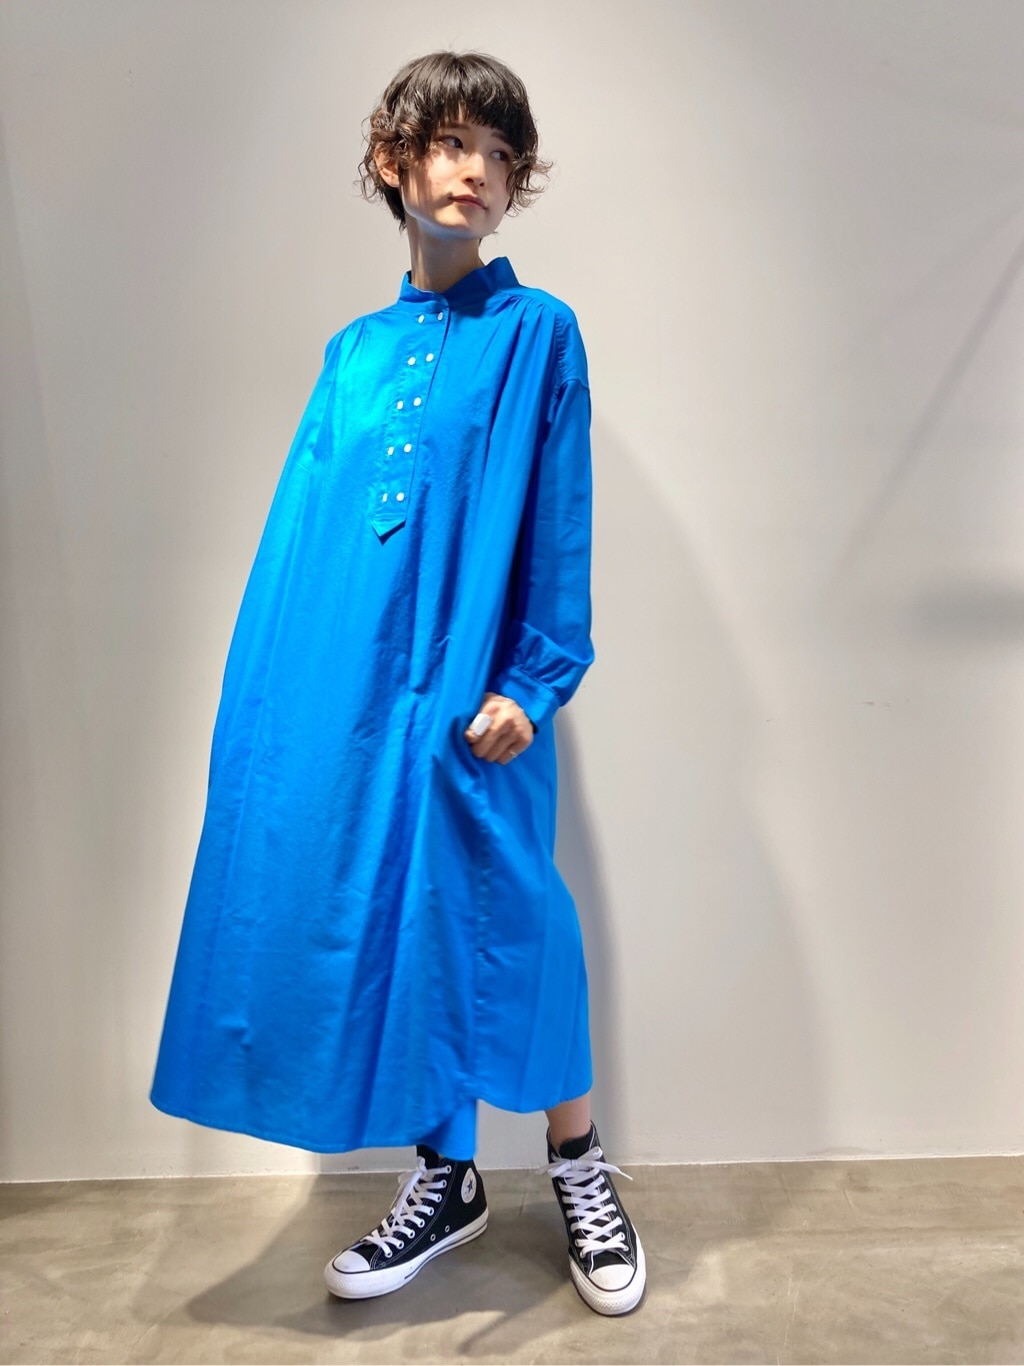 yuni / bulle de savon 京都路面 身長:159cm 2020.08.17